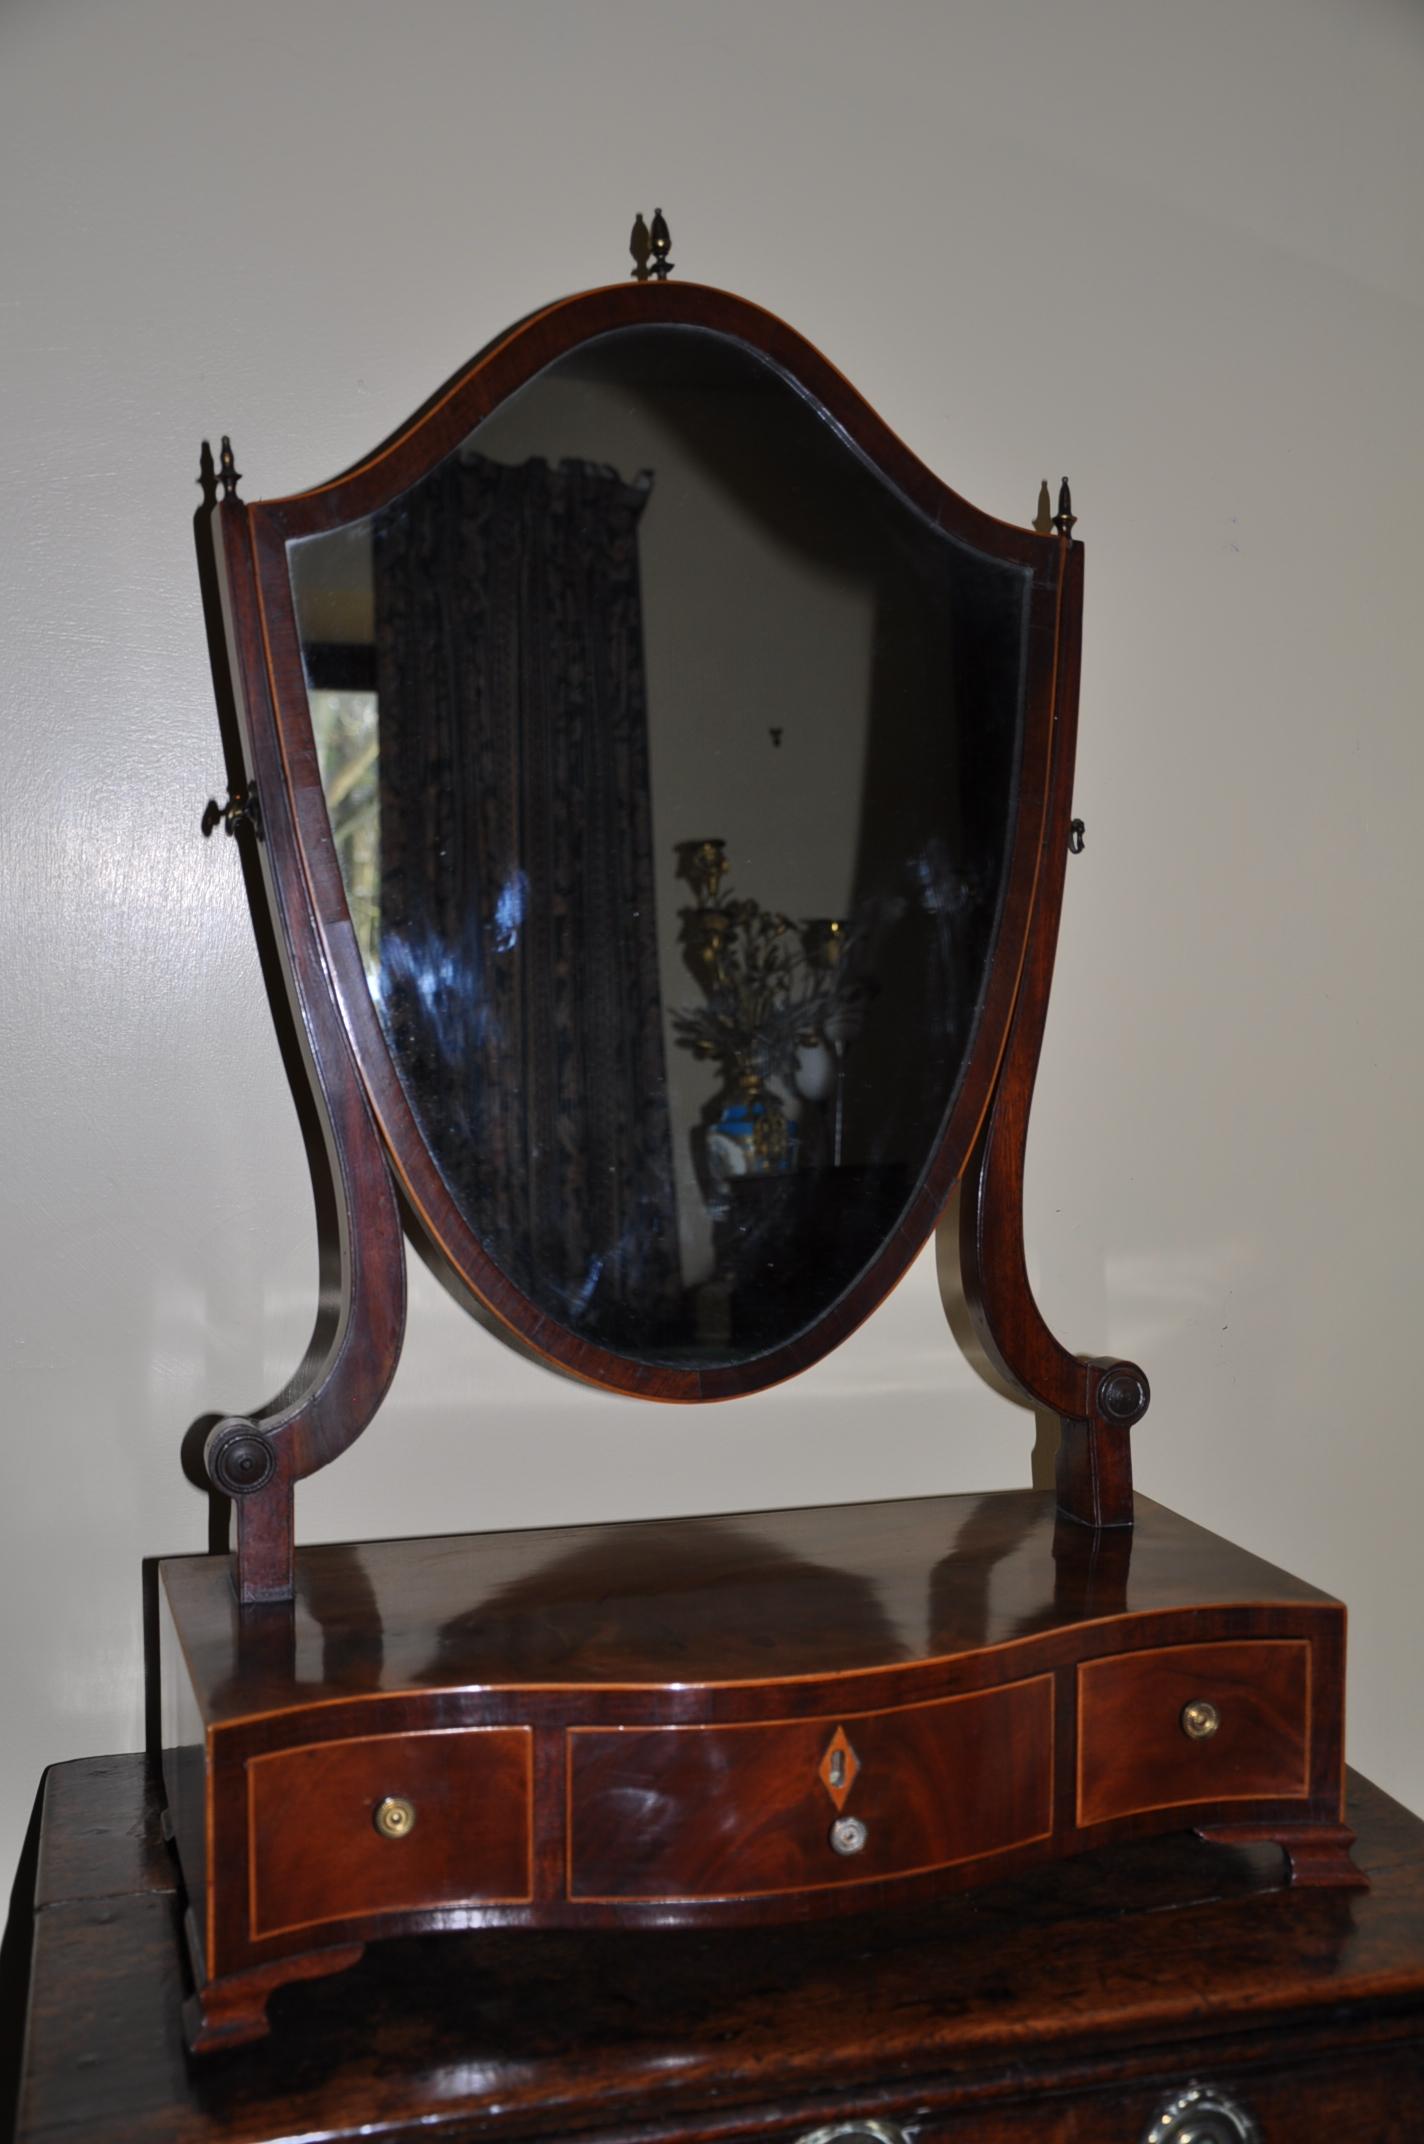 DSC_0178 copy mirror